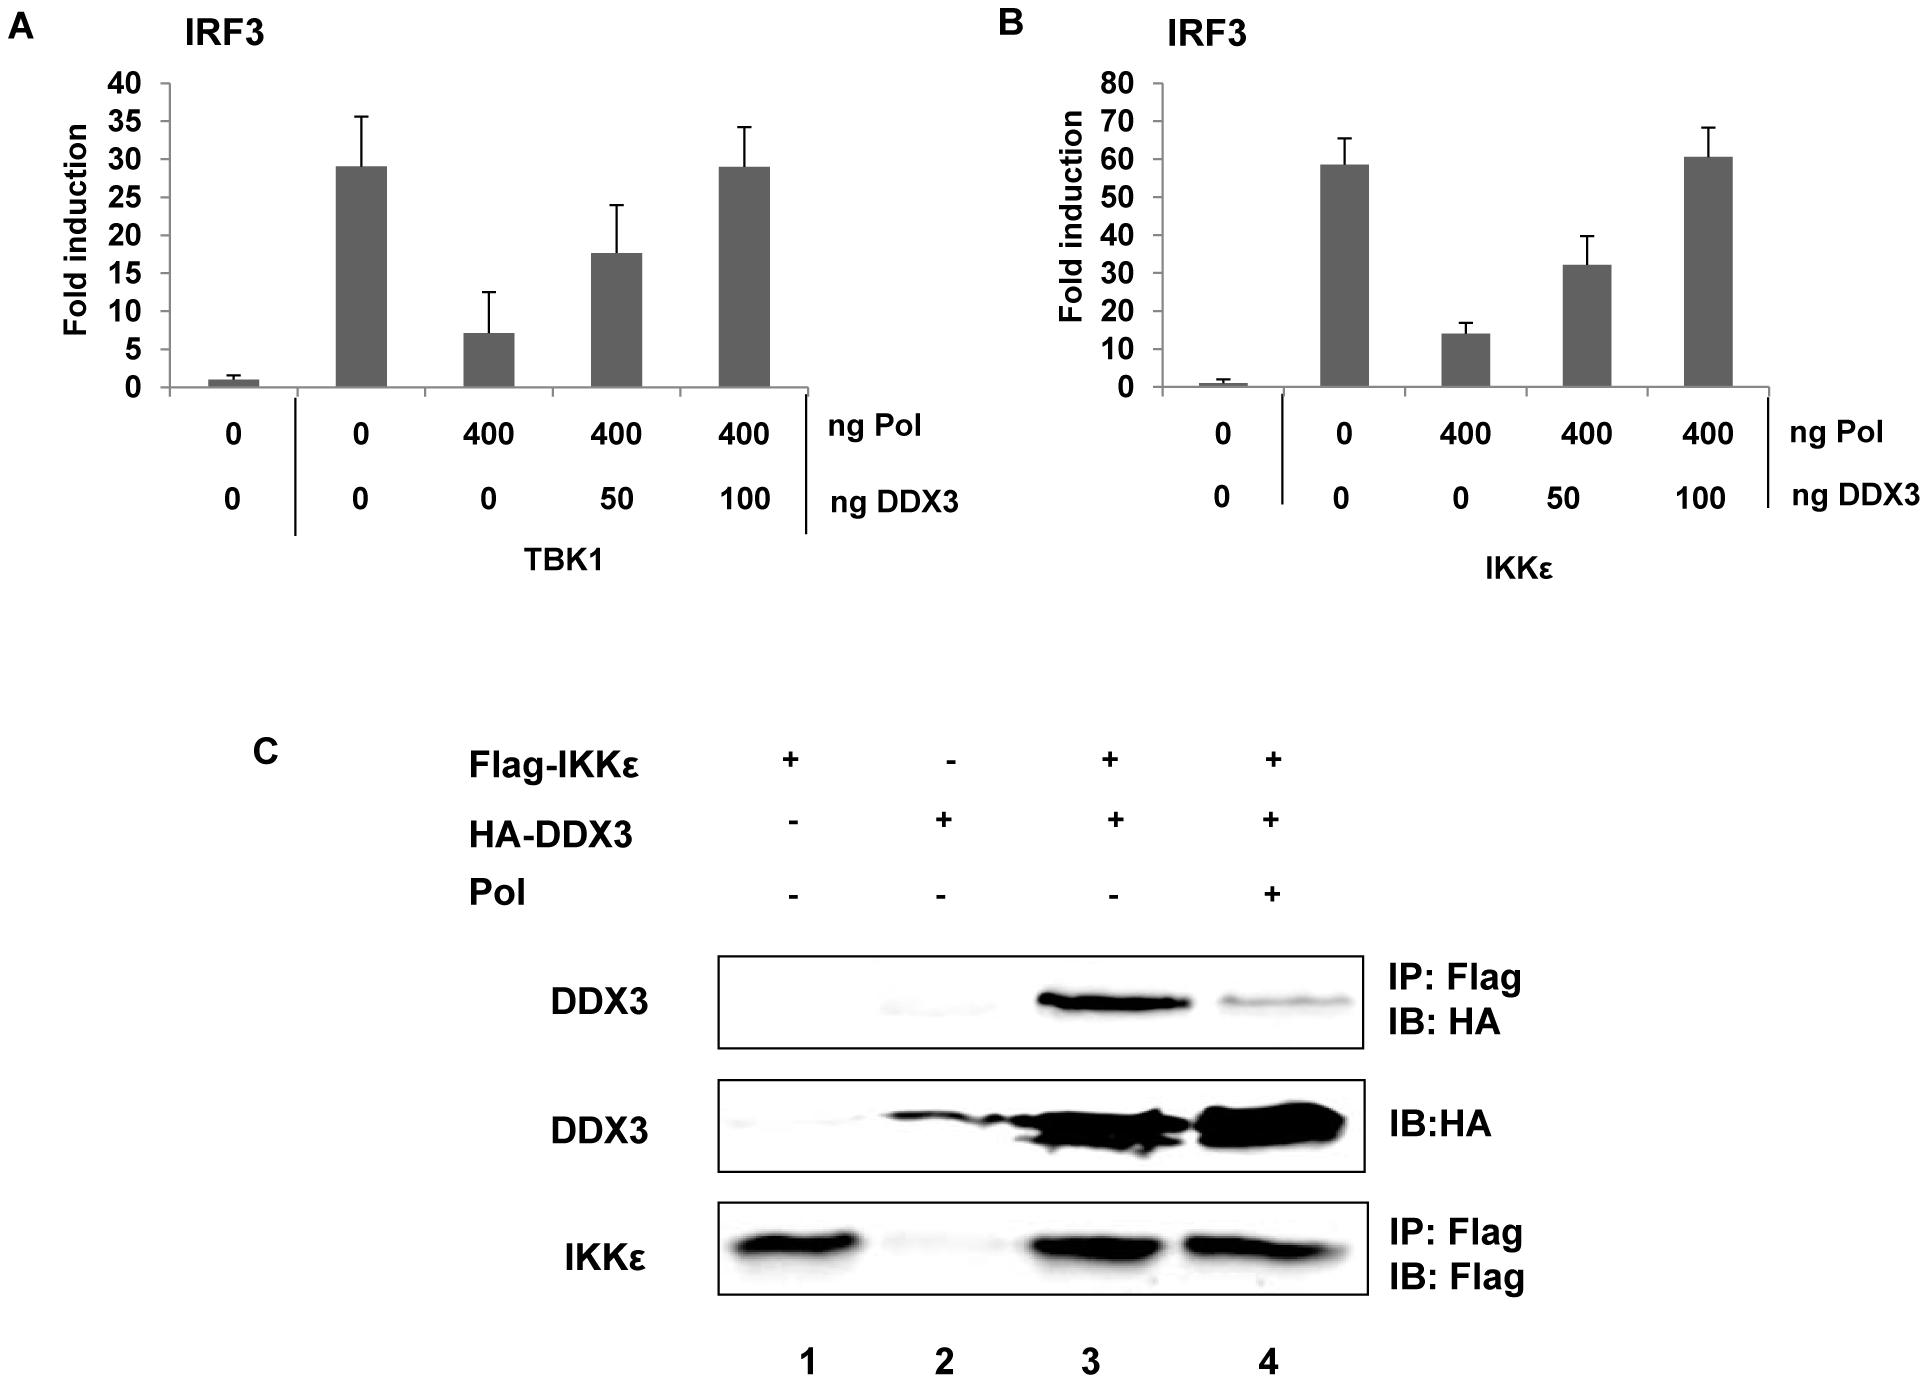 HBV Pol inhibits TBK1/IKKε via an interaction with DDX3.